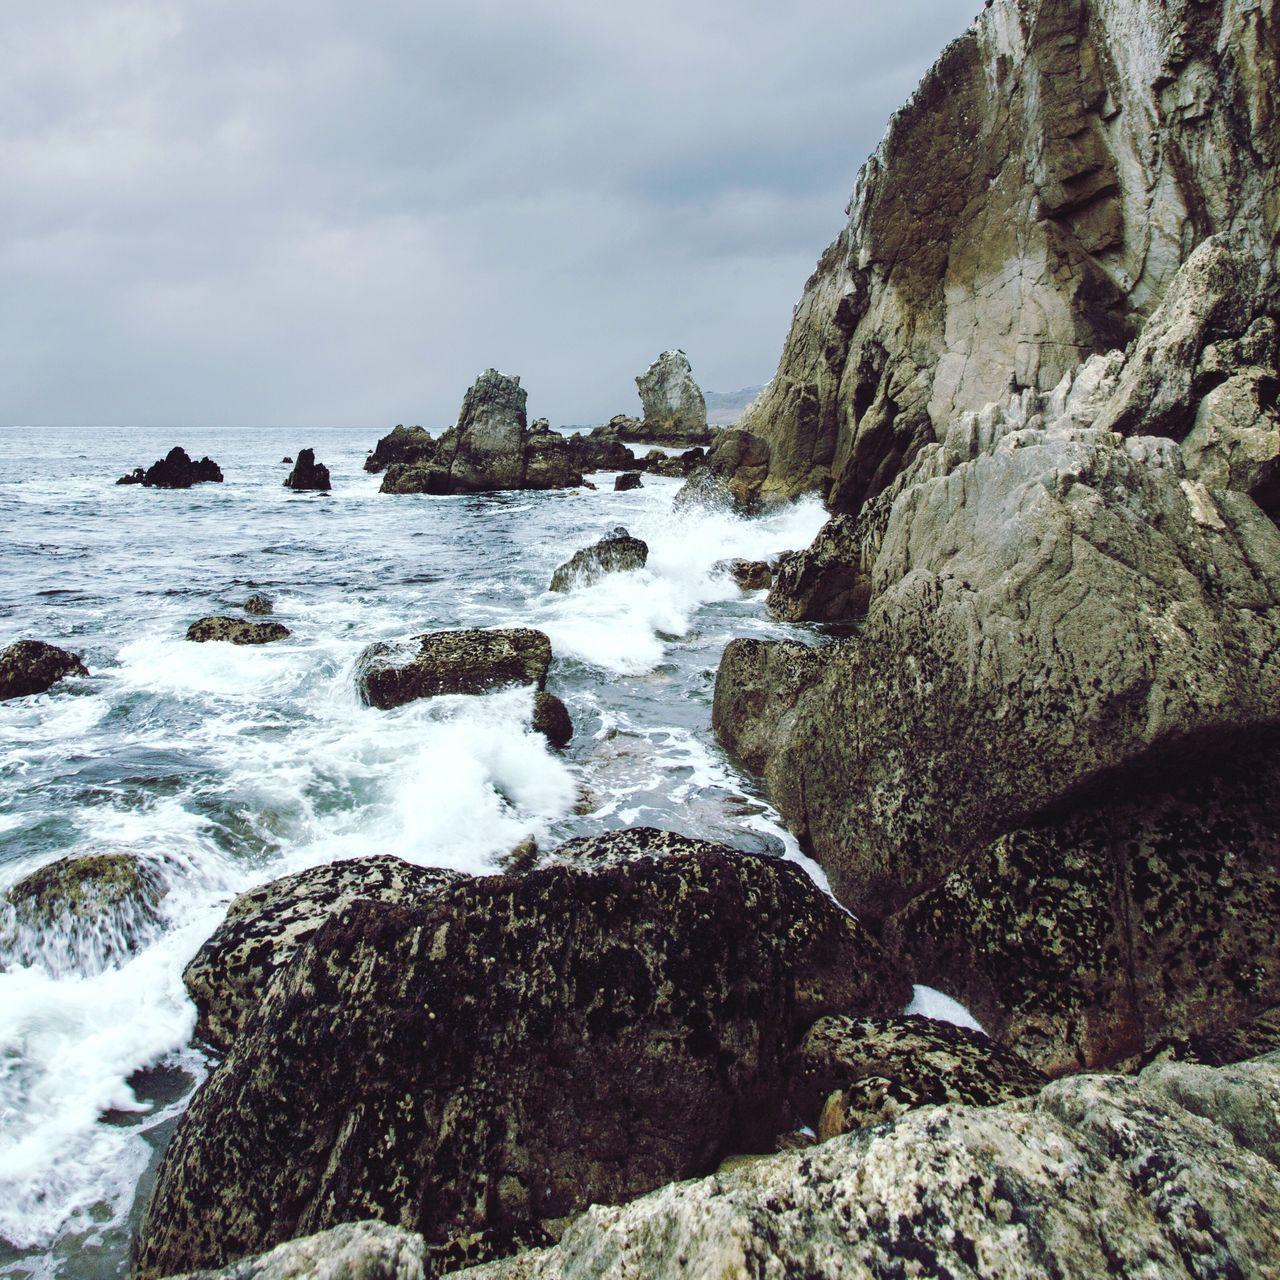 Achill Achill Island Ireland Ireland🍀 Water Sea Rock - Object Beauty In Nature Coastal Coast County Mayo Coastline Wildatlanticway Rugged